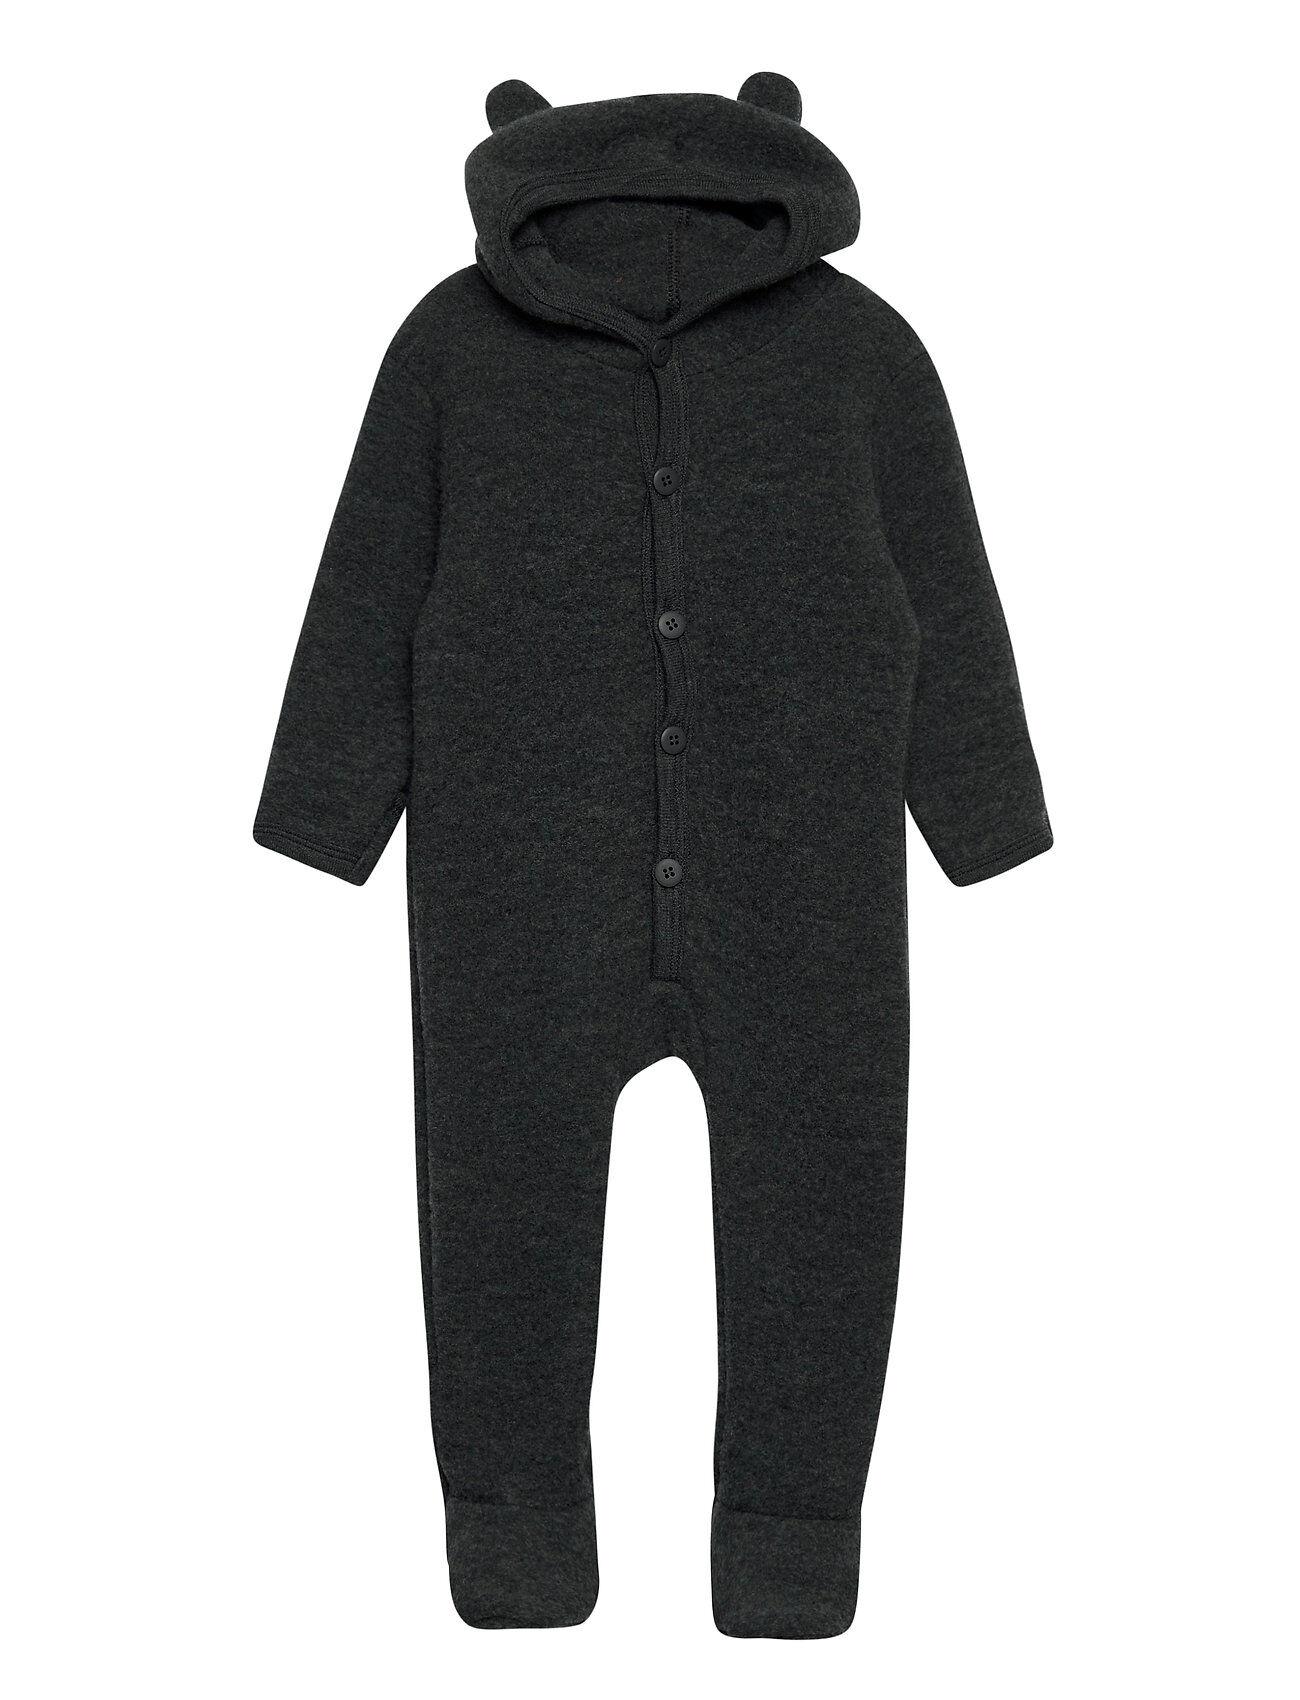 Fixoni Hush Wool Wholesuit Outerwear Base Layers Harmaa Fixoni